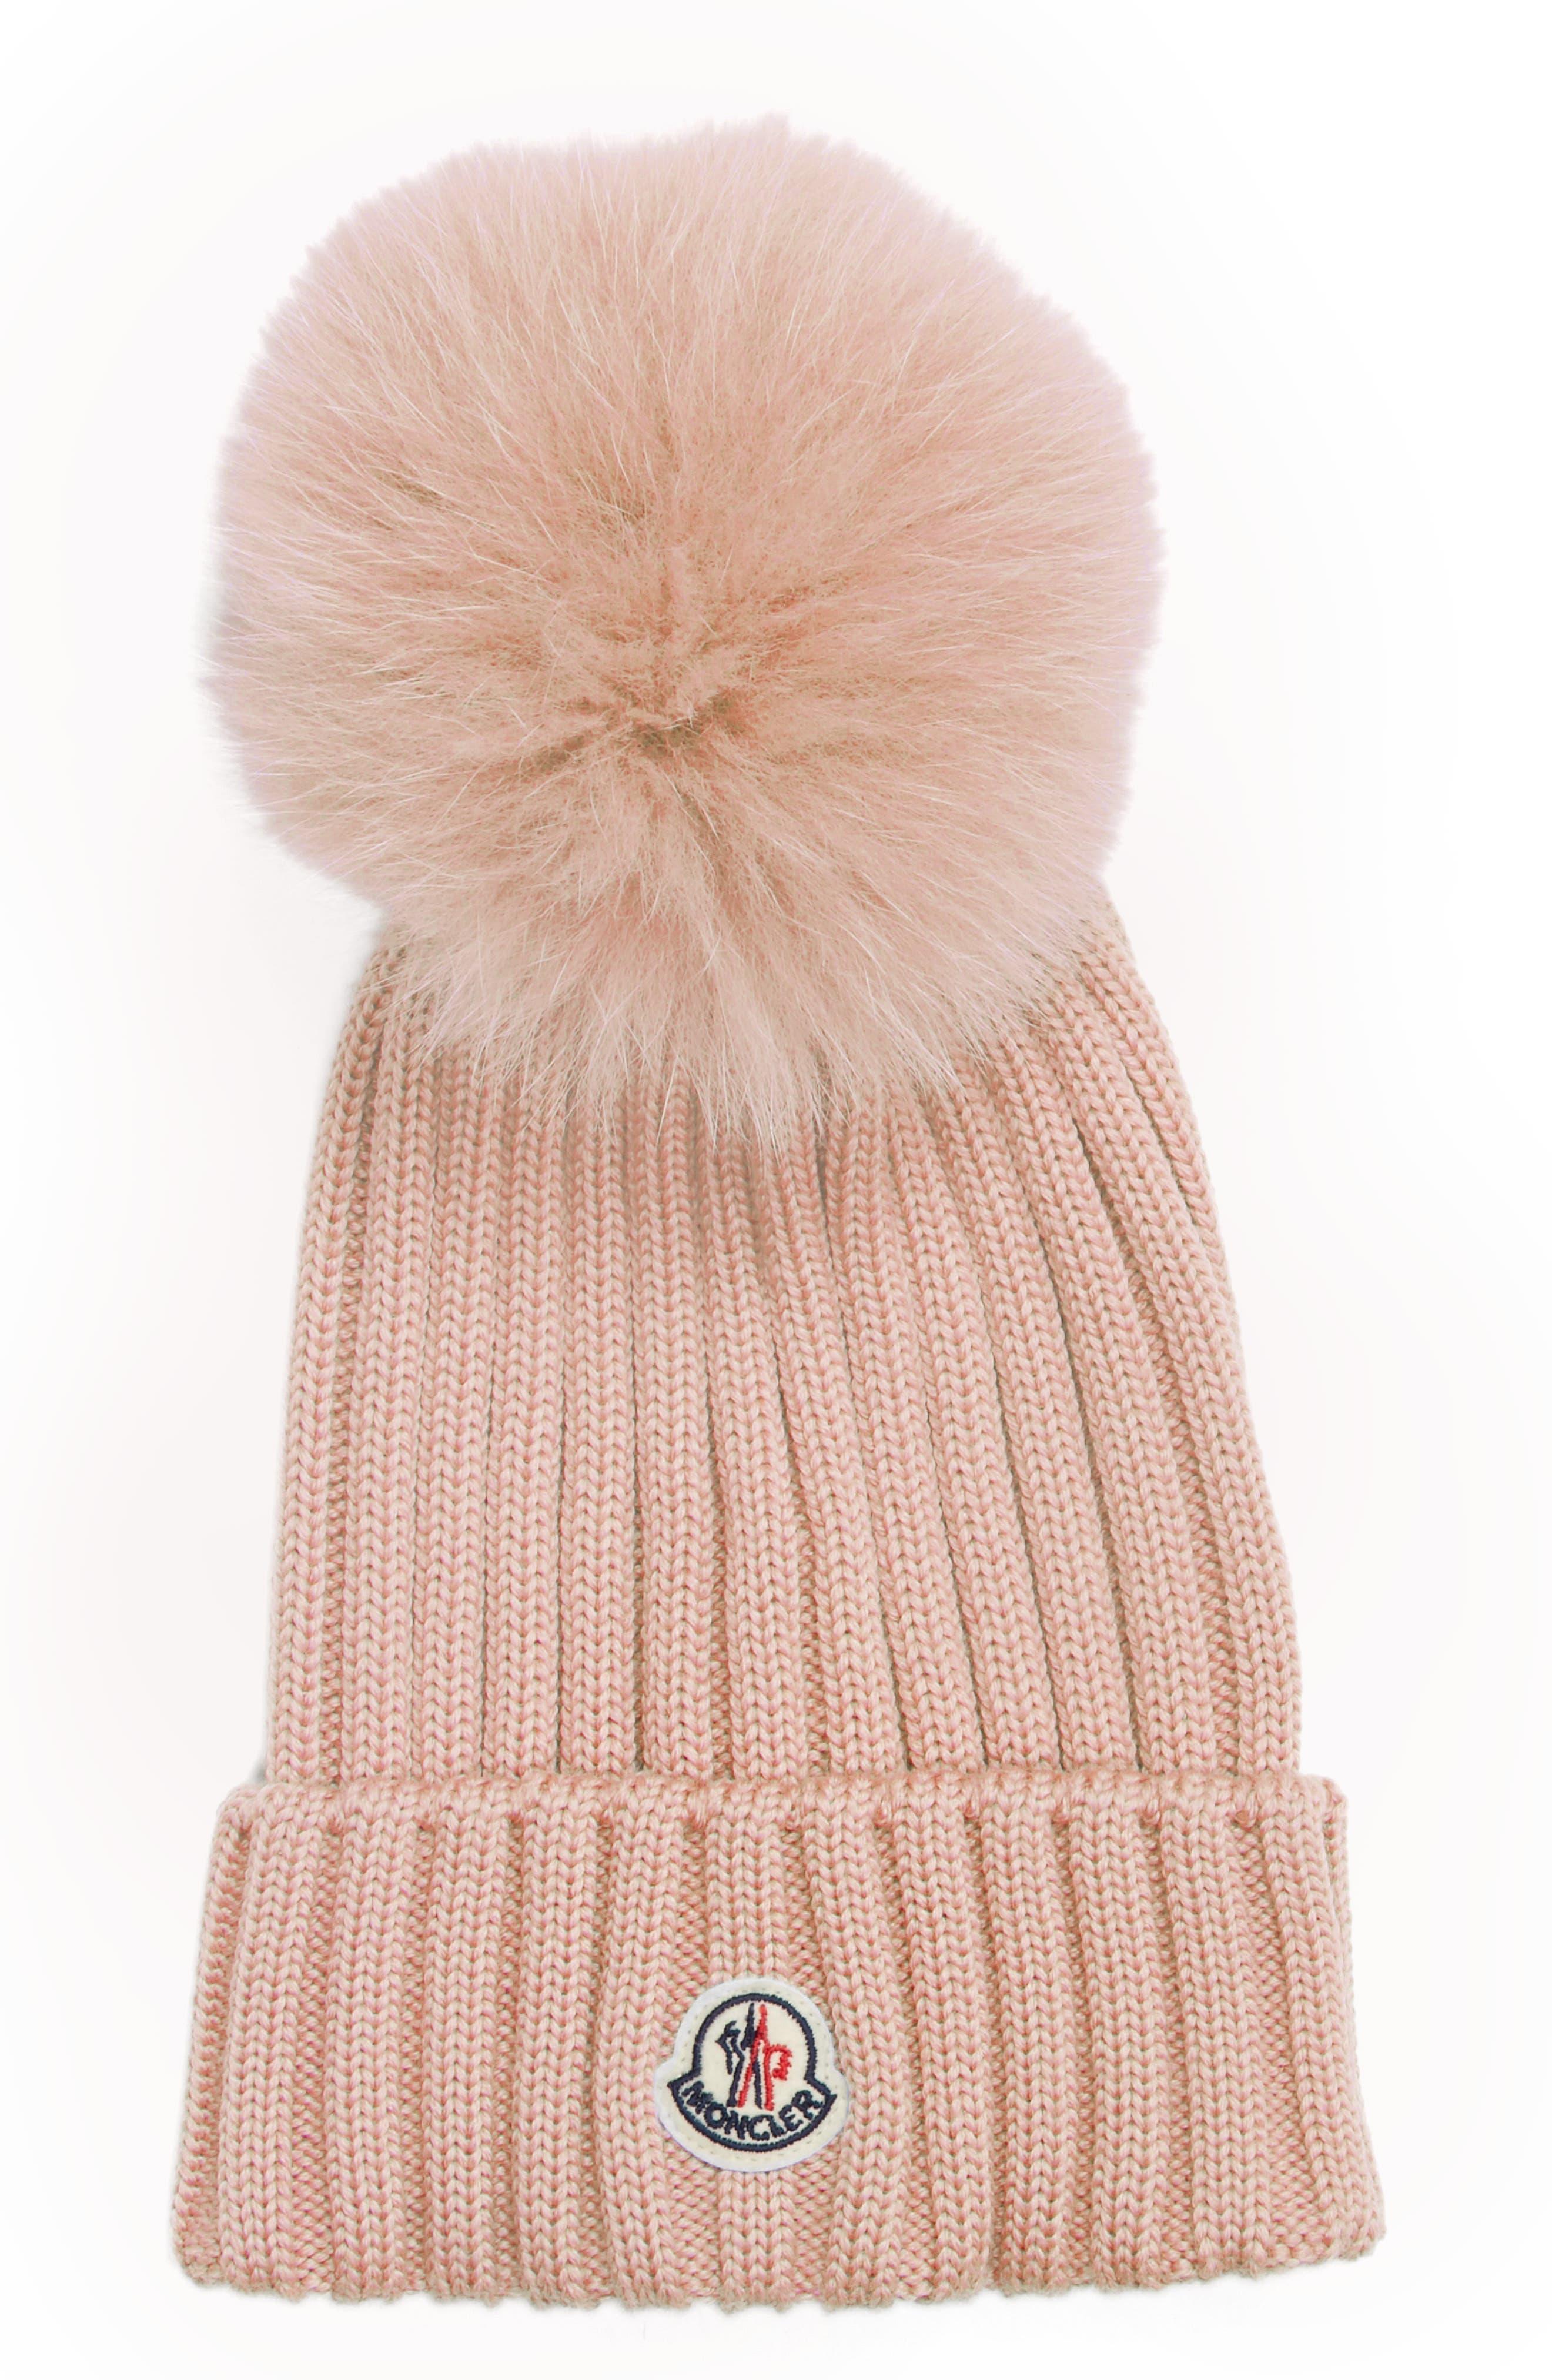 Alternate Image 1 Selected - Moncler Genuine Fox Fur Pom Wool Beanie